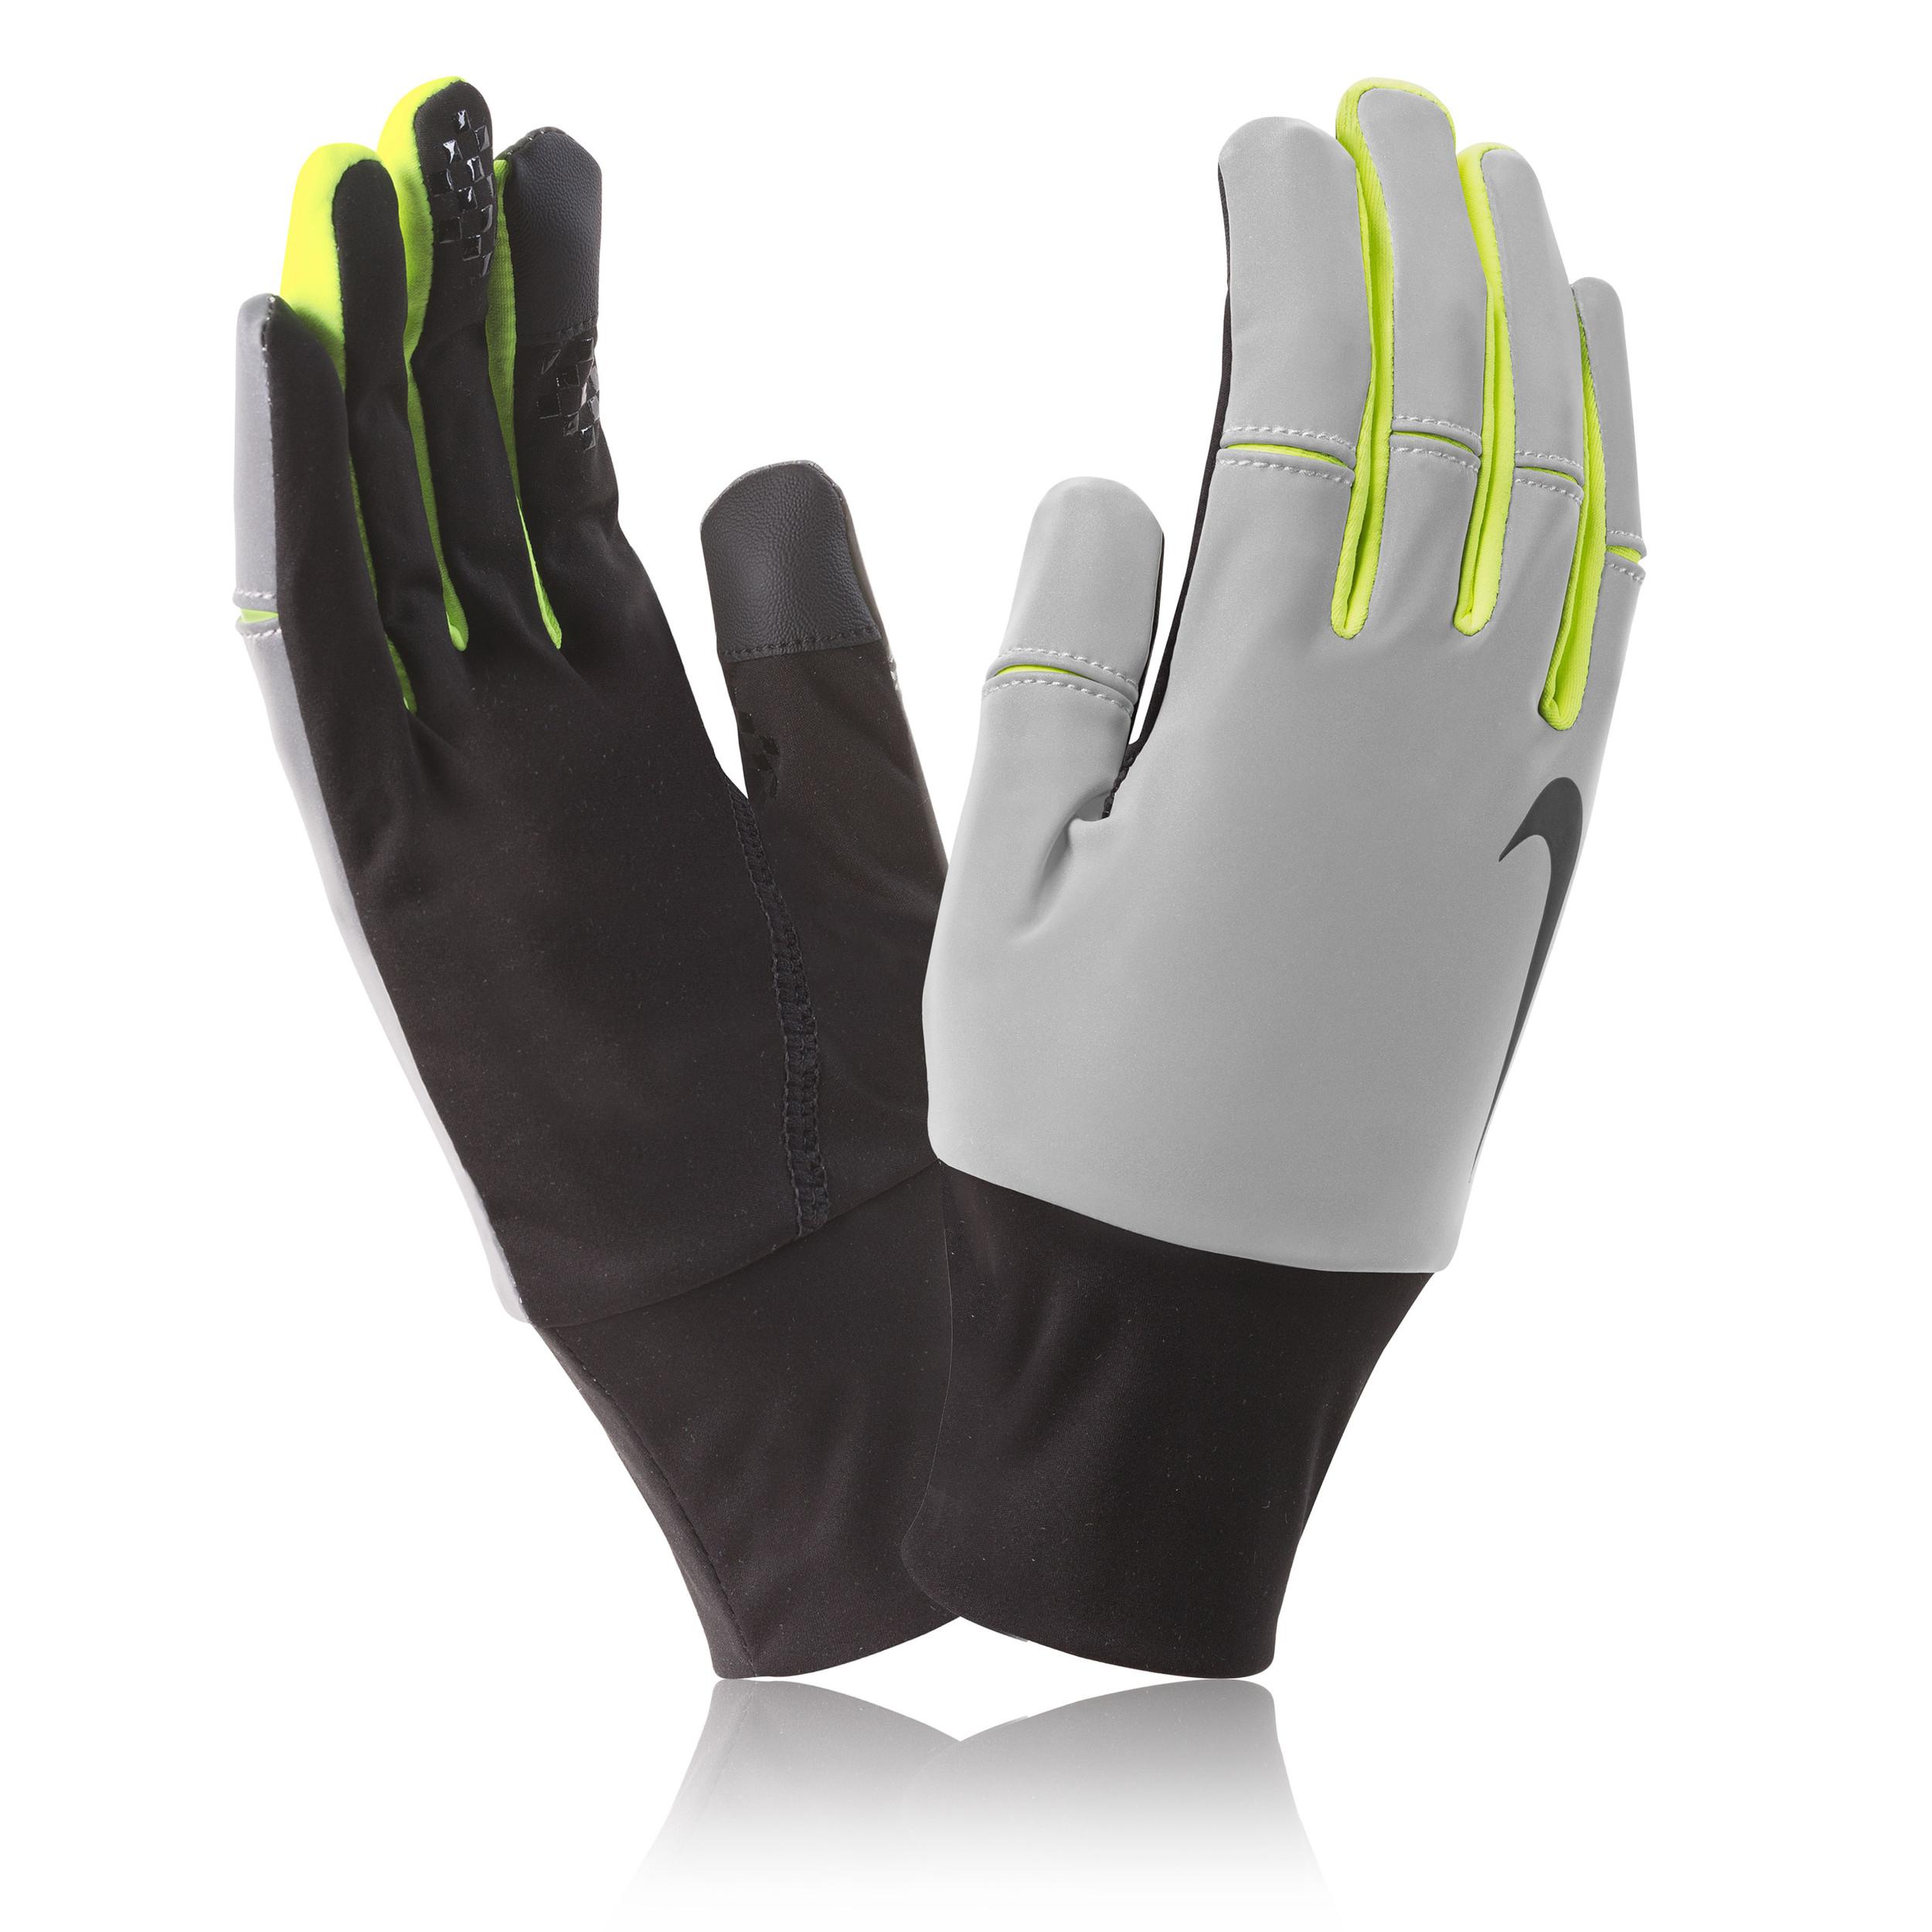 Nike Hockey Gloves: Nike Vapor Flash Running Glove